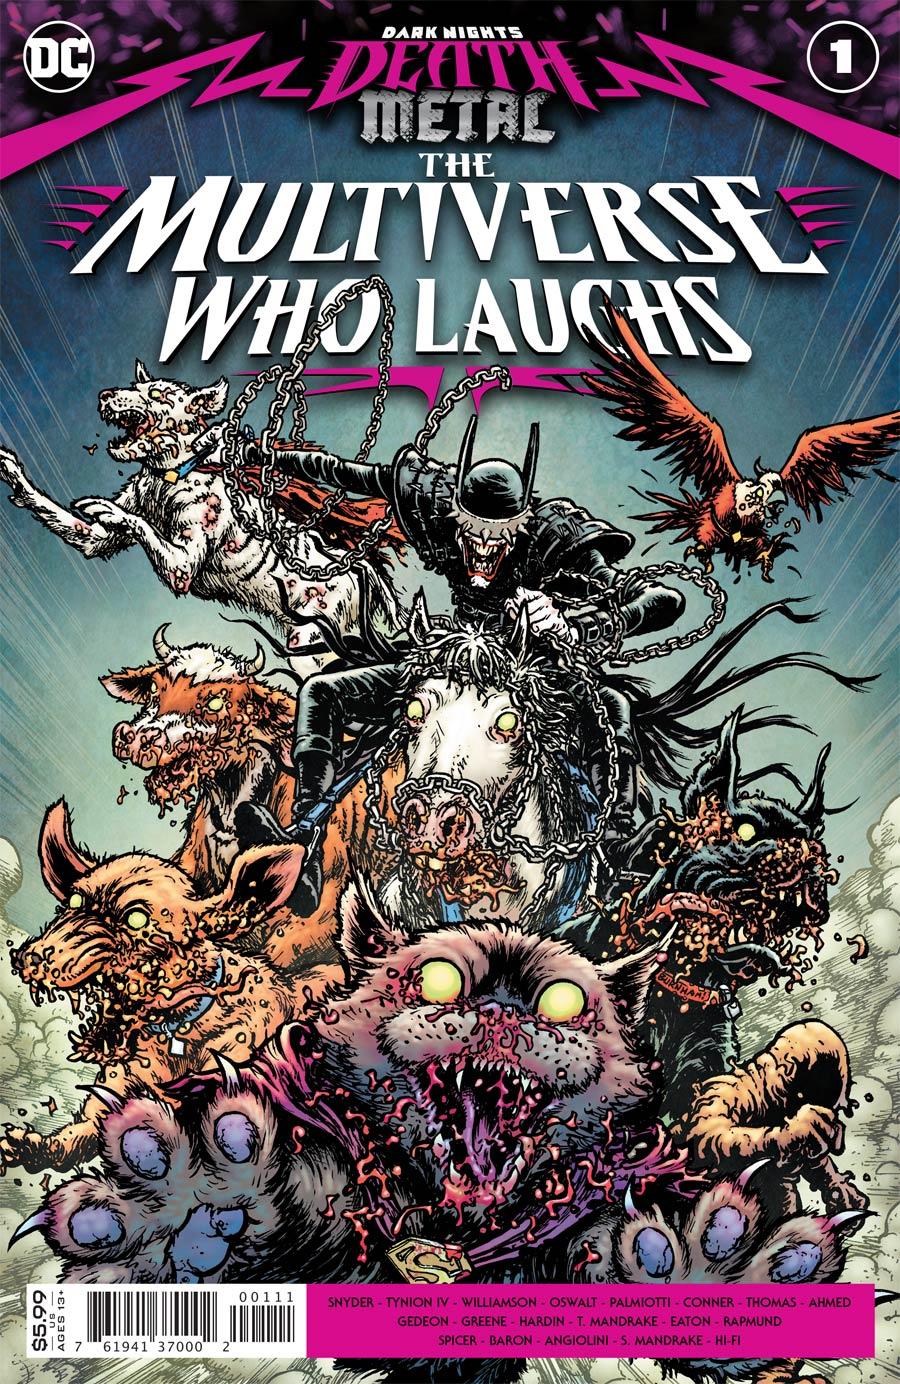 Dark Nights Death Metal Multiverse Who Laughs One Shot Cover A Regular Chris Burnham Cover